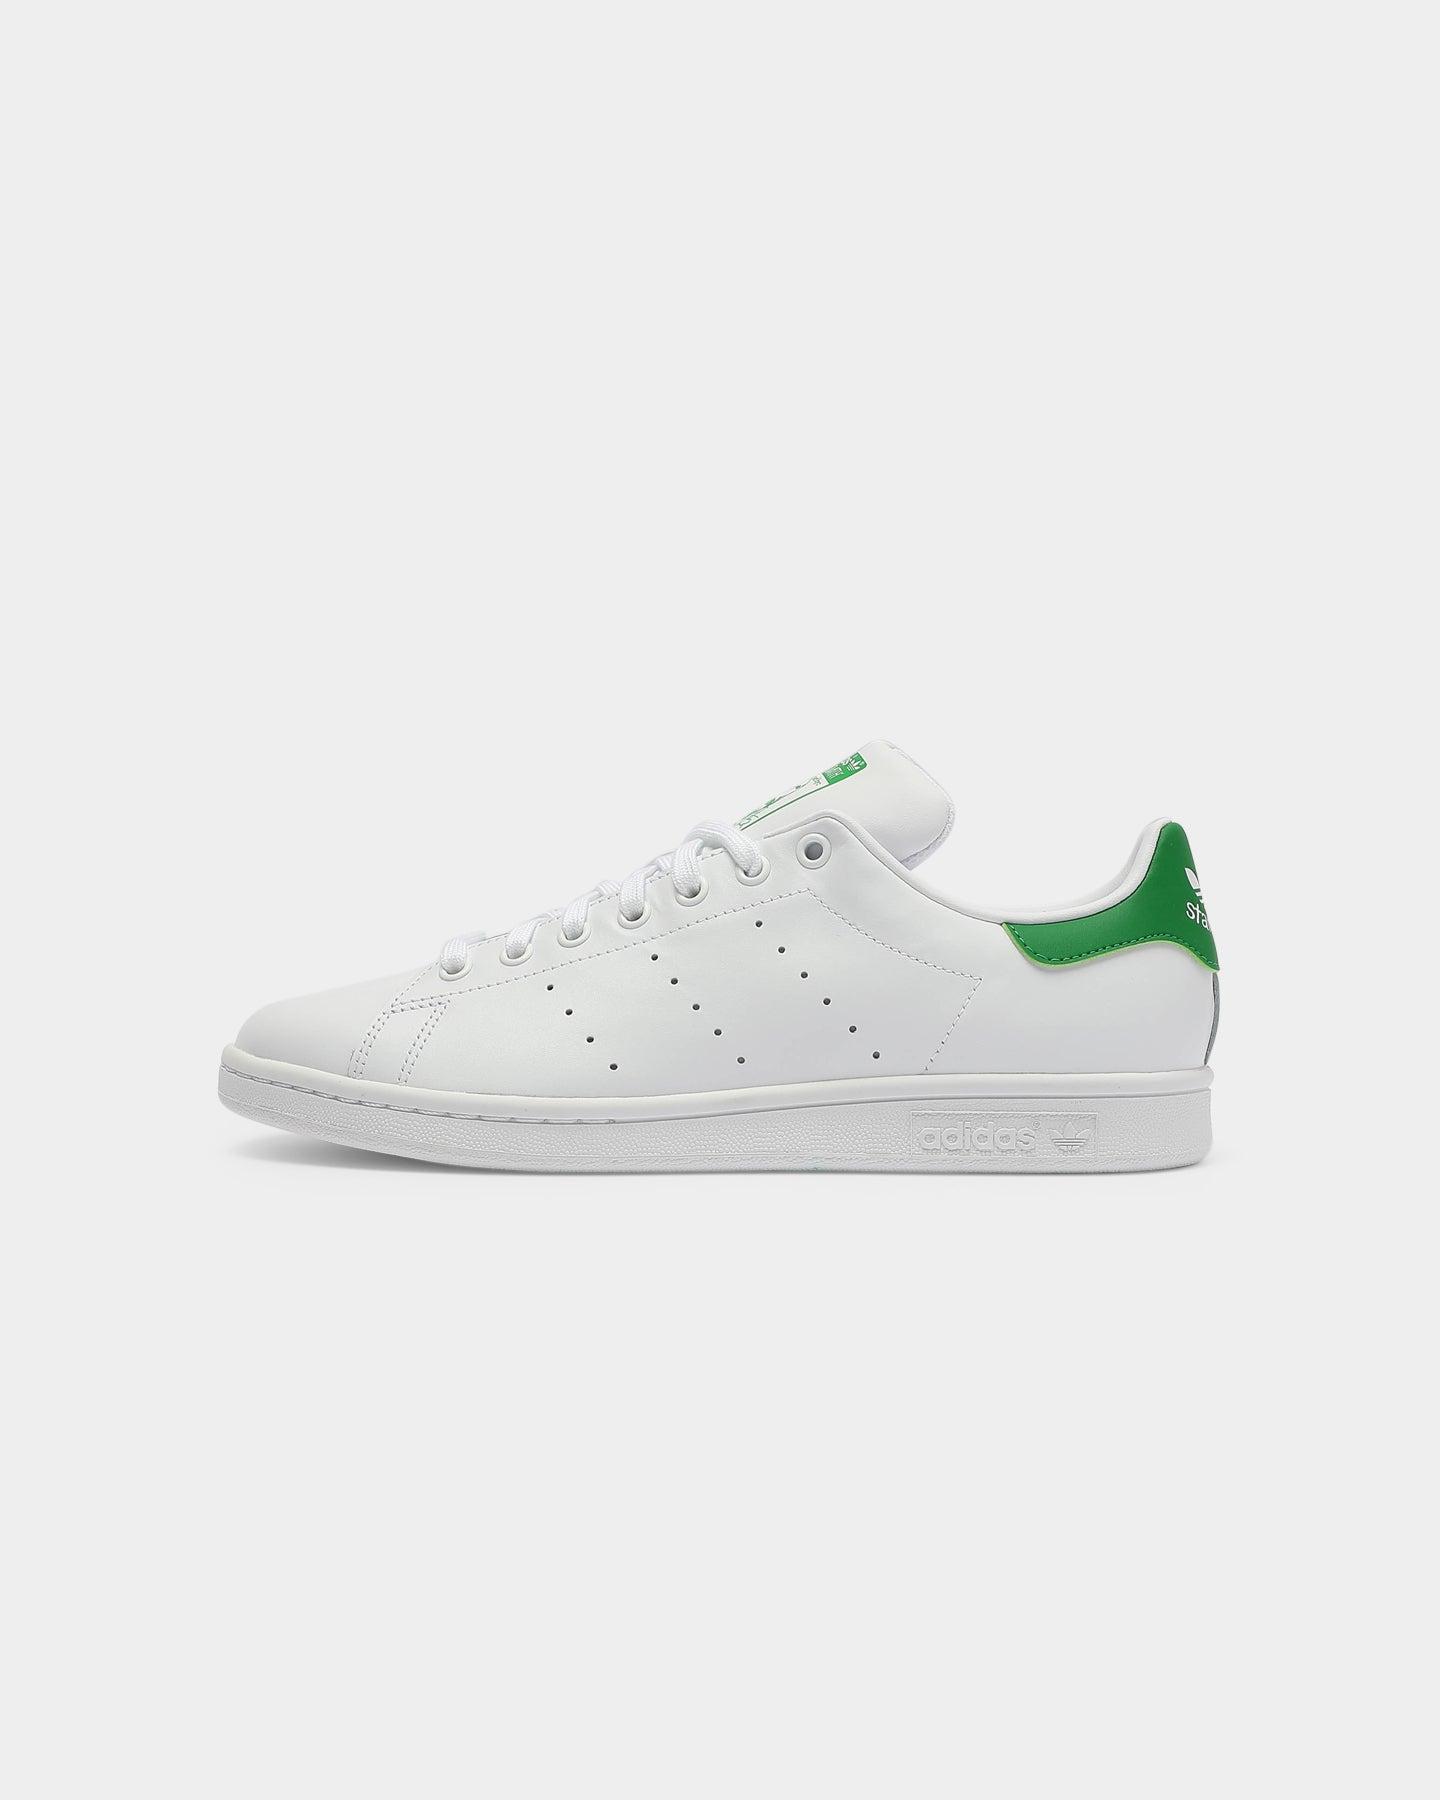 Adidas Originals Stan Smith Whitegreen